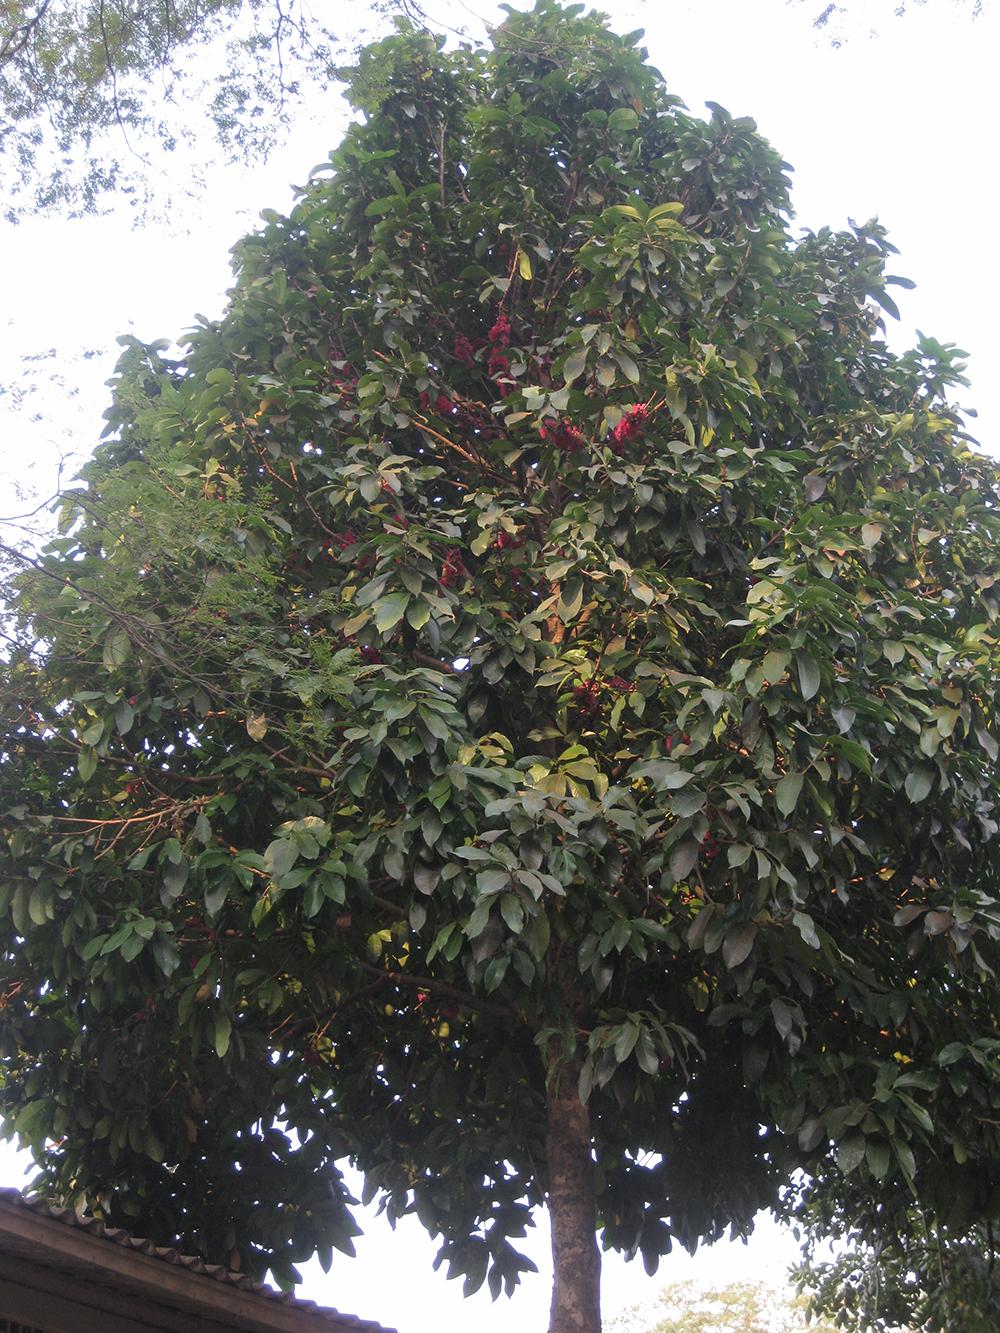 Foto: Hipolito Paulino - Syzygium malaccense (L.) Merr. & L.M. Perry - Jambo vermelho